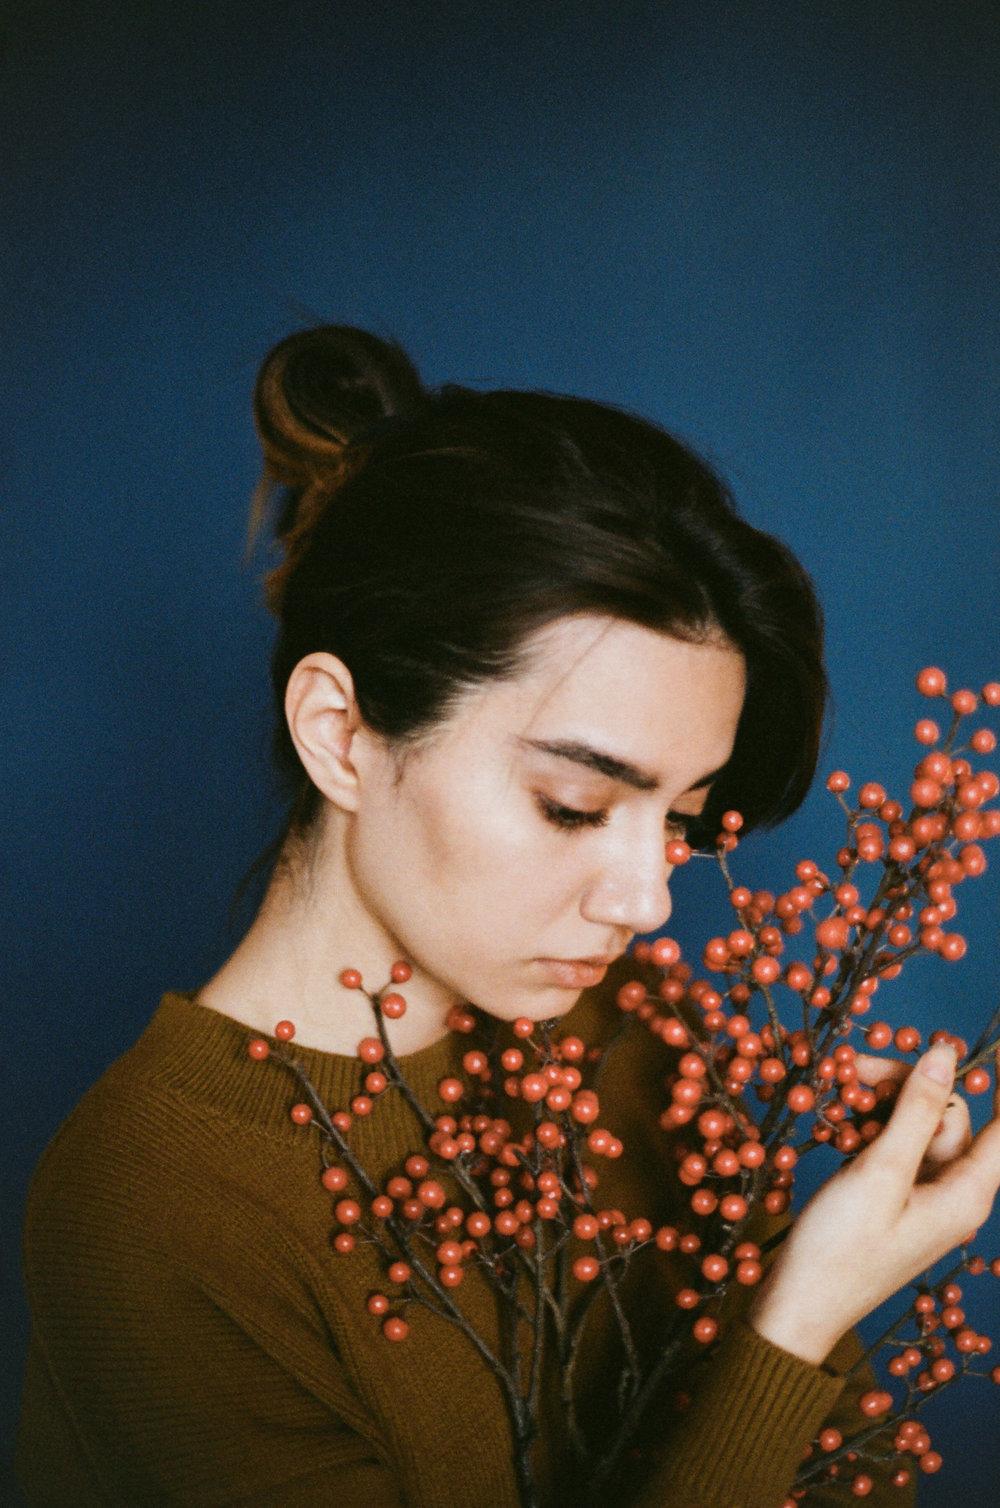 Kamola Akilova Uzbekistan Ektar 100 Canon a1 Portrait Brooklyn Studio Blue